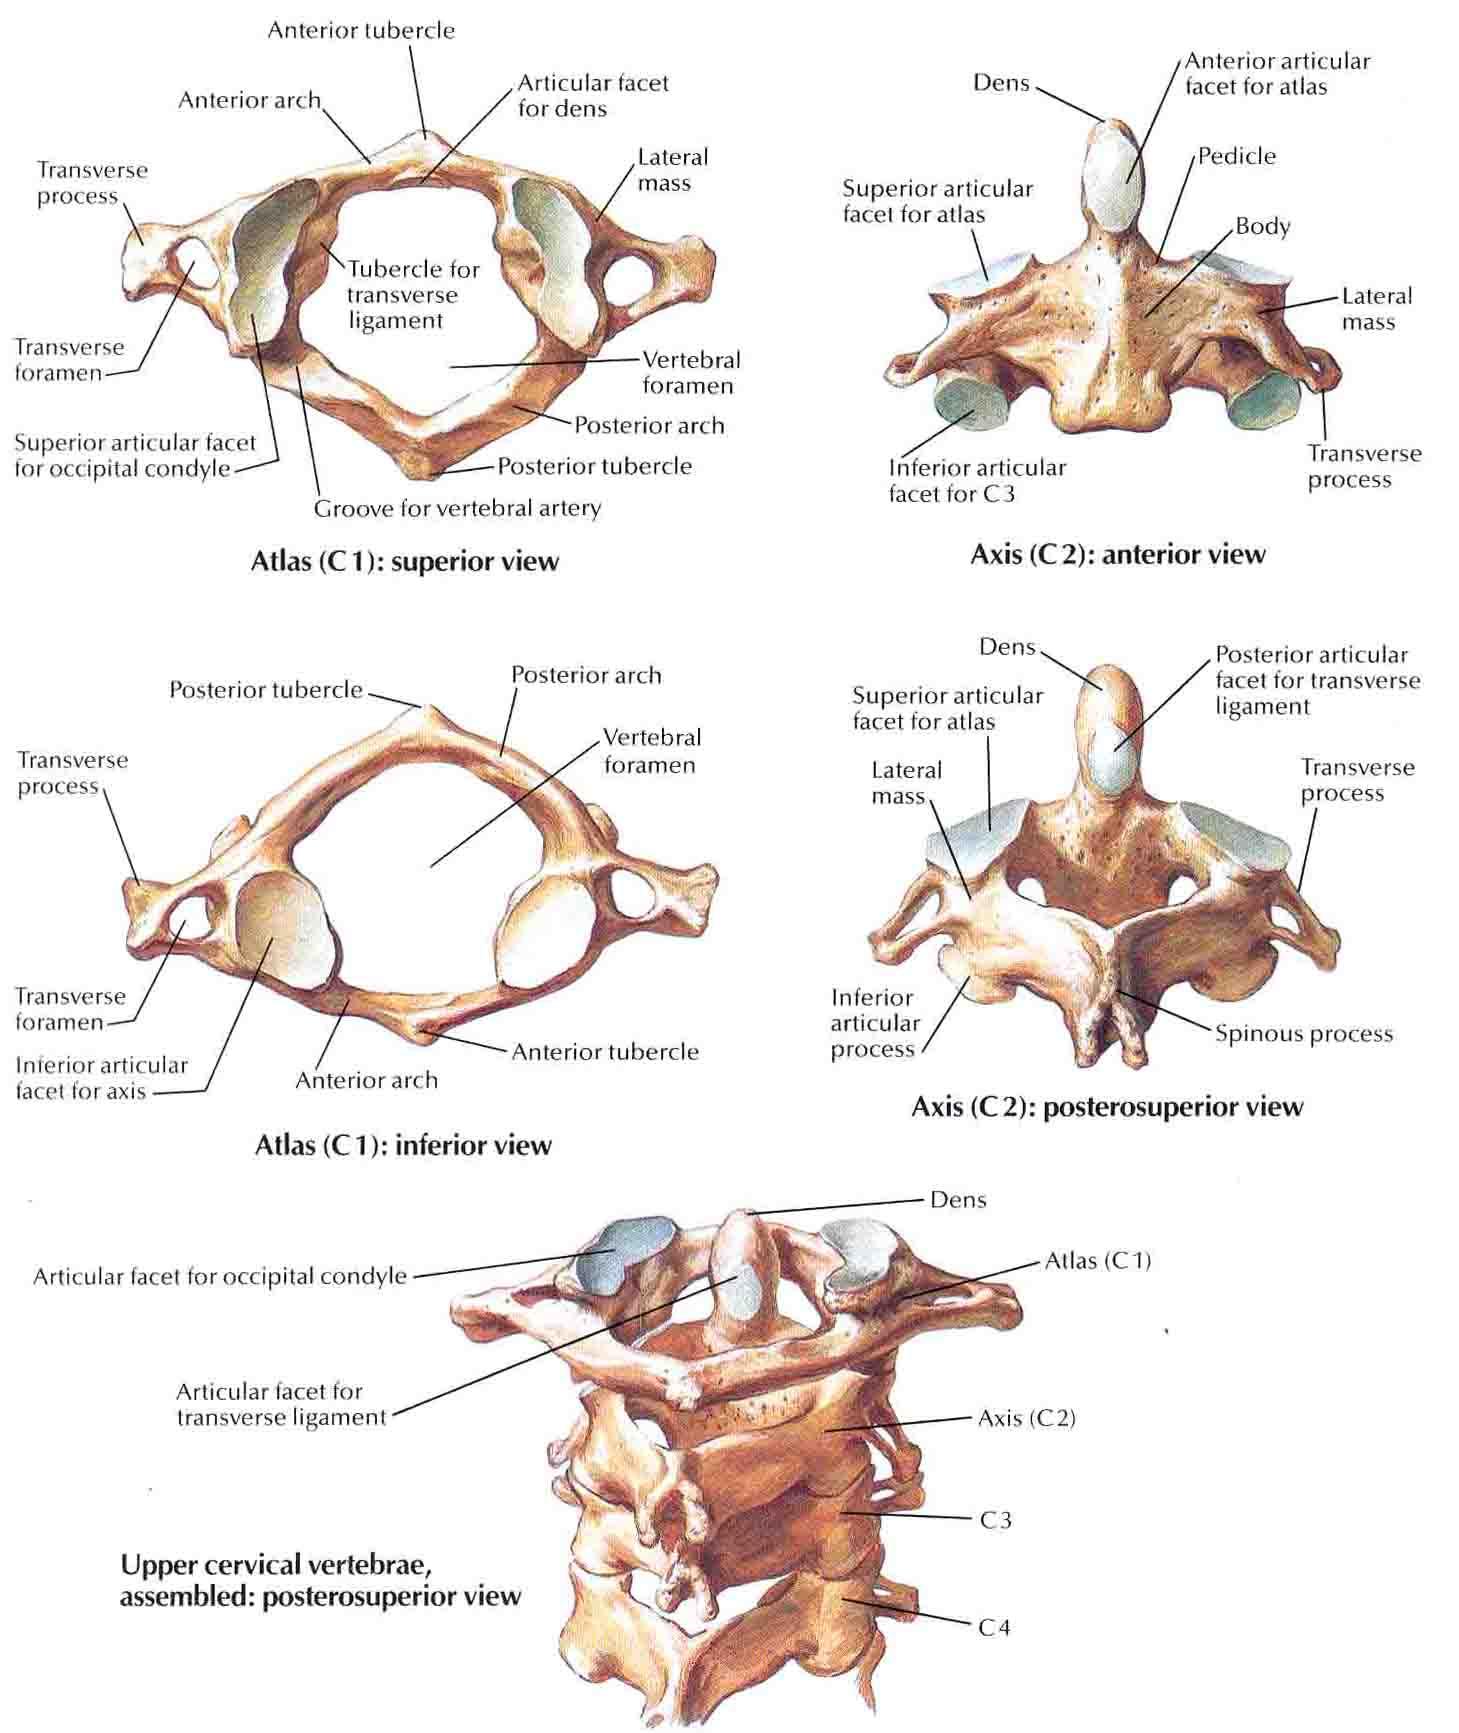 Atlas Cervical Vertebrae Diagram - Electrical Work Wiring Diagram •